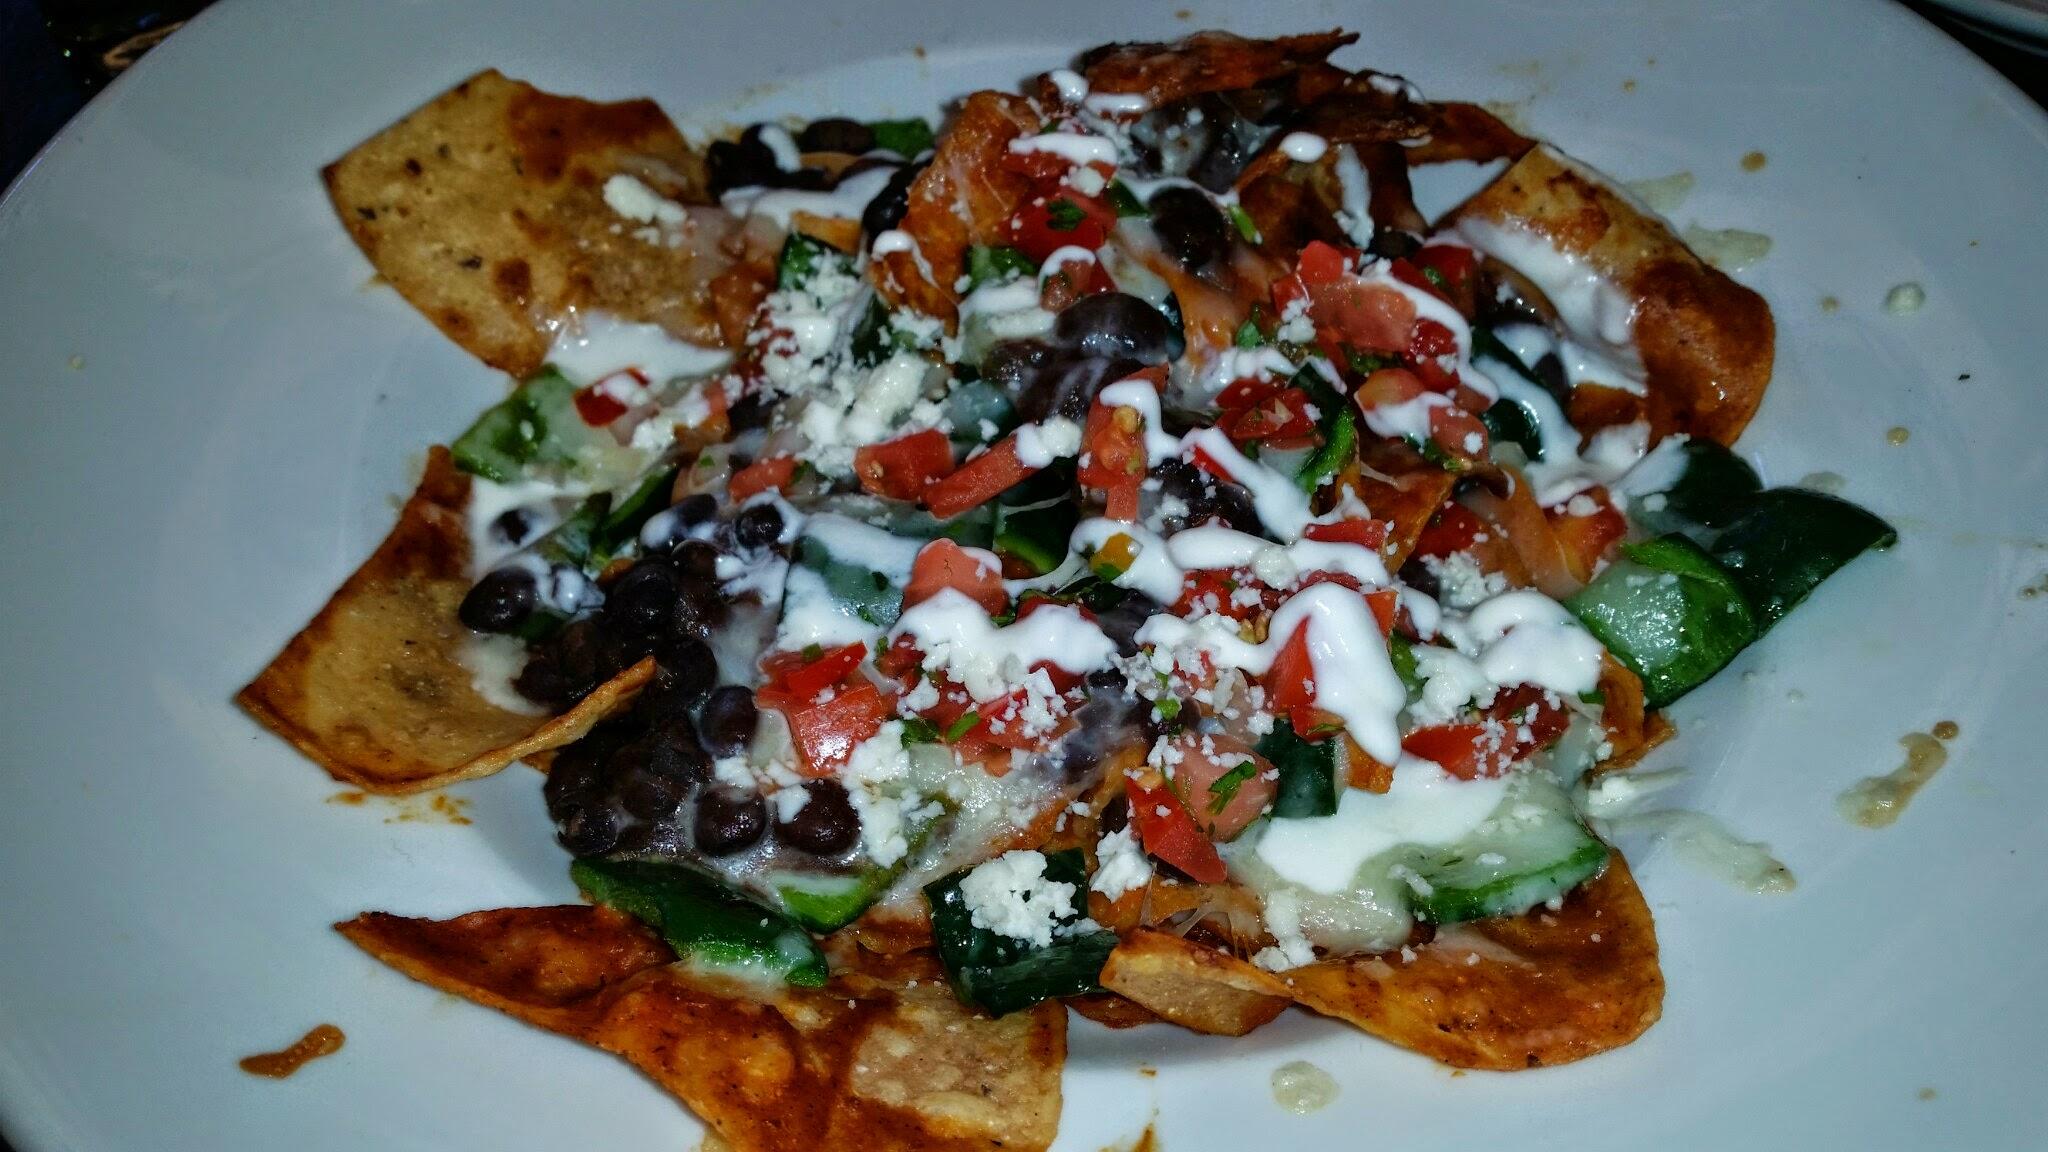 Tortilla Republic Brunch In Laguna Beach Is The Place To